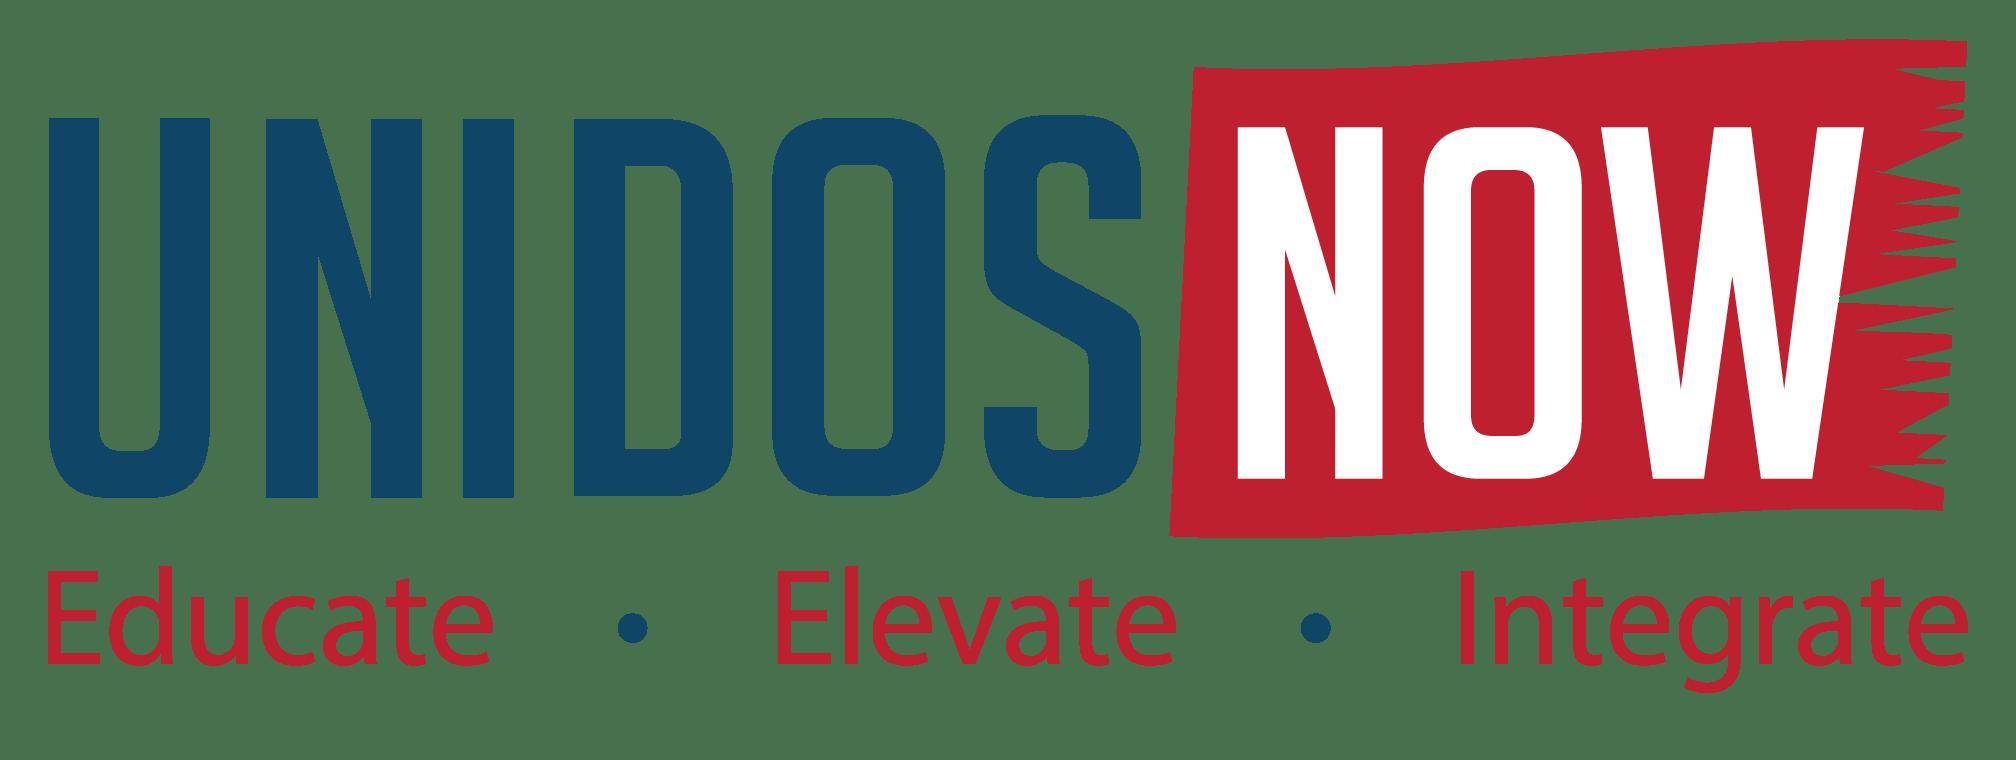 UnidosNow logo